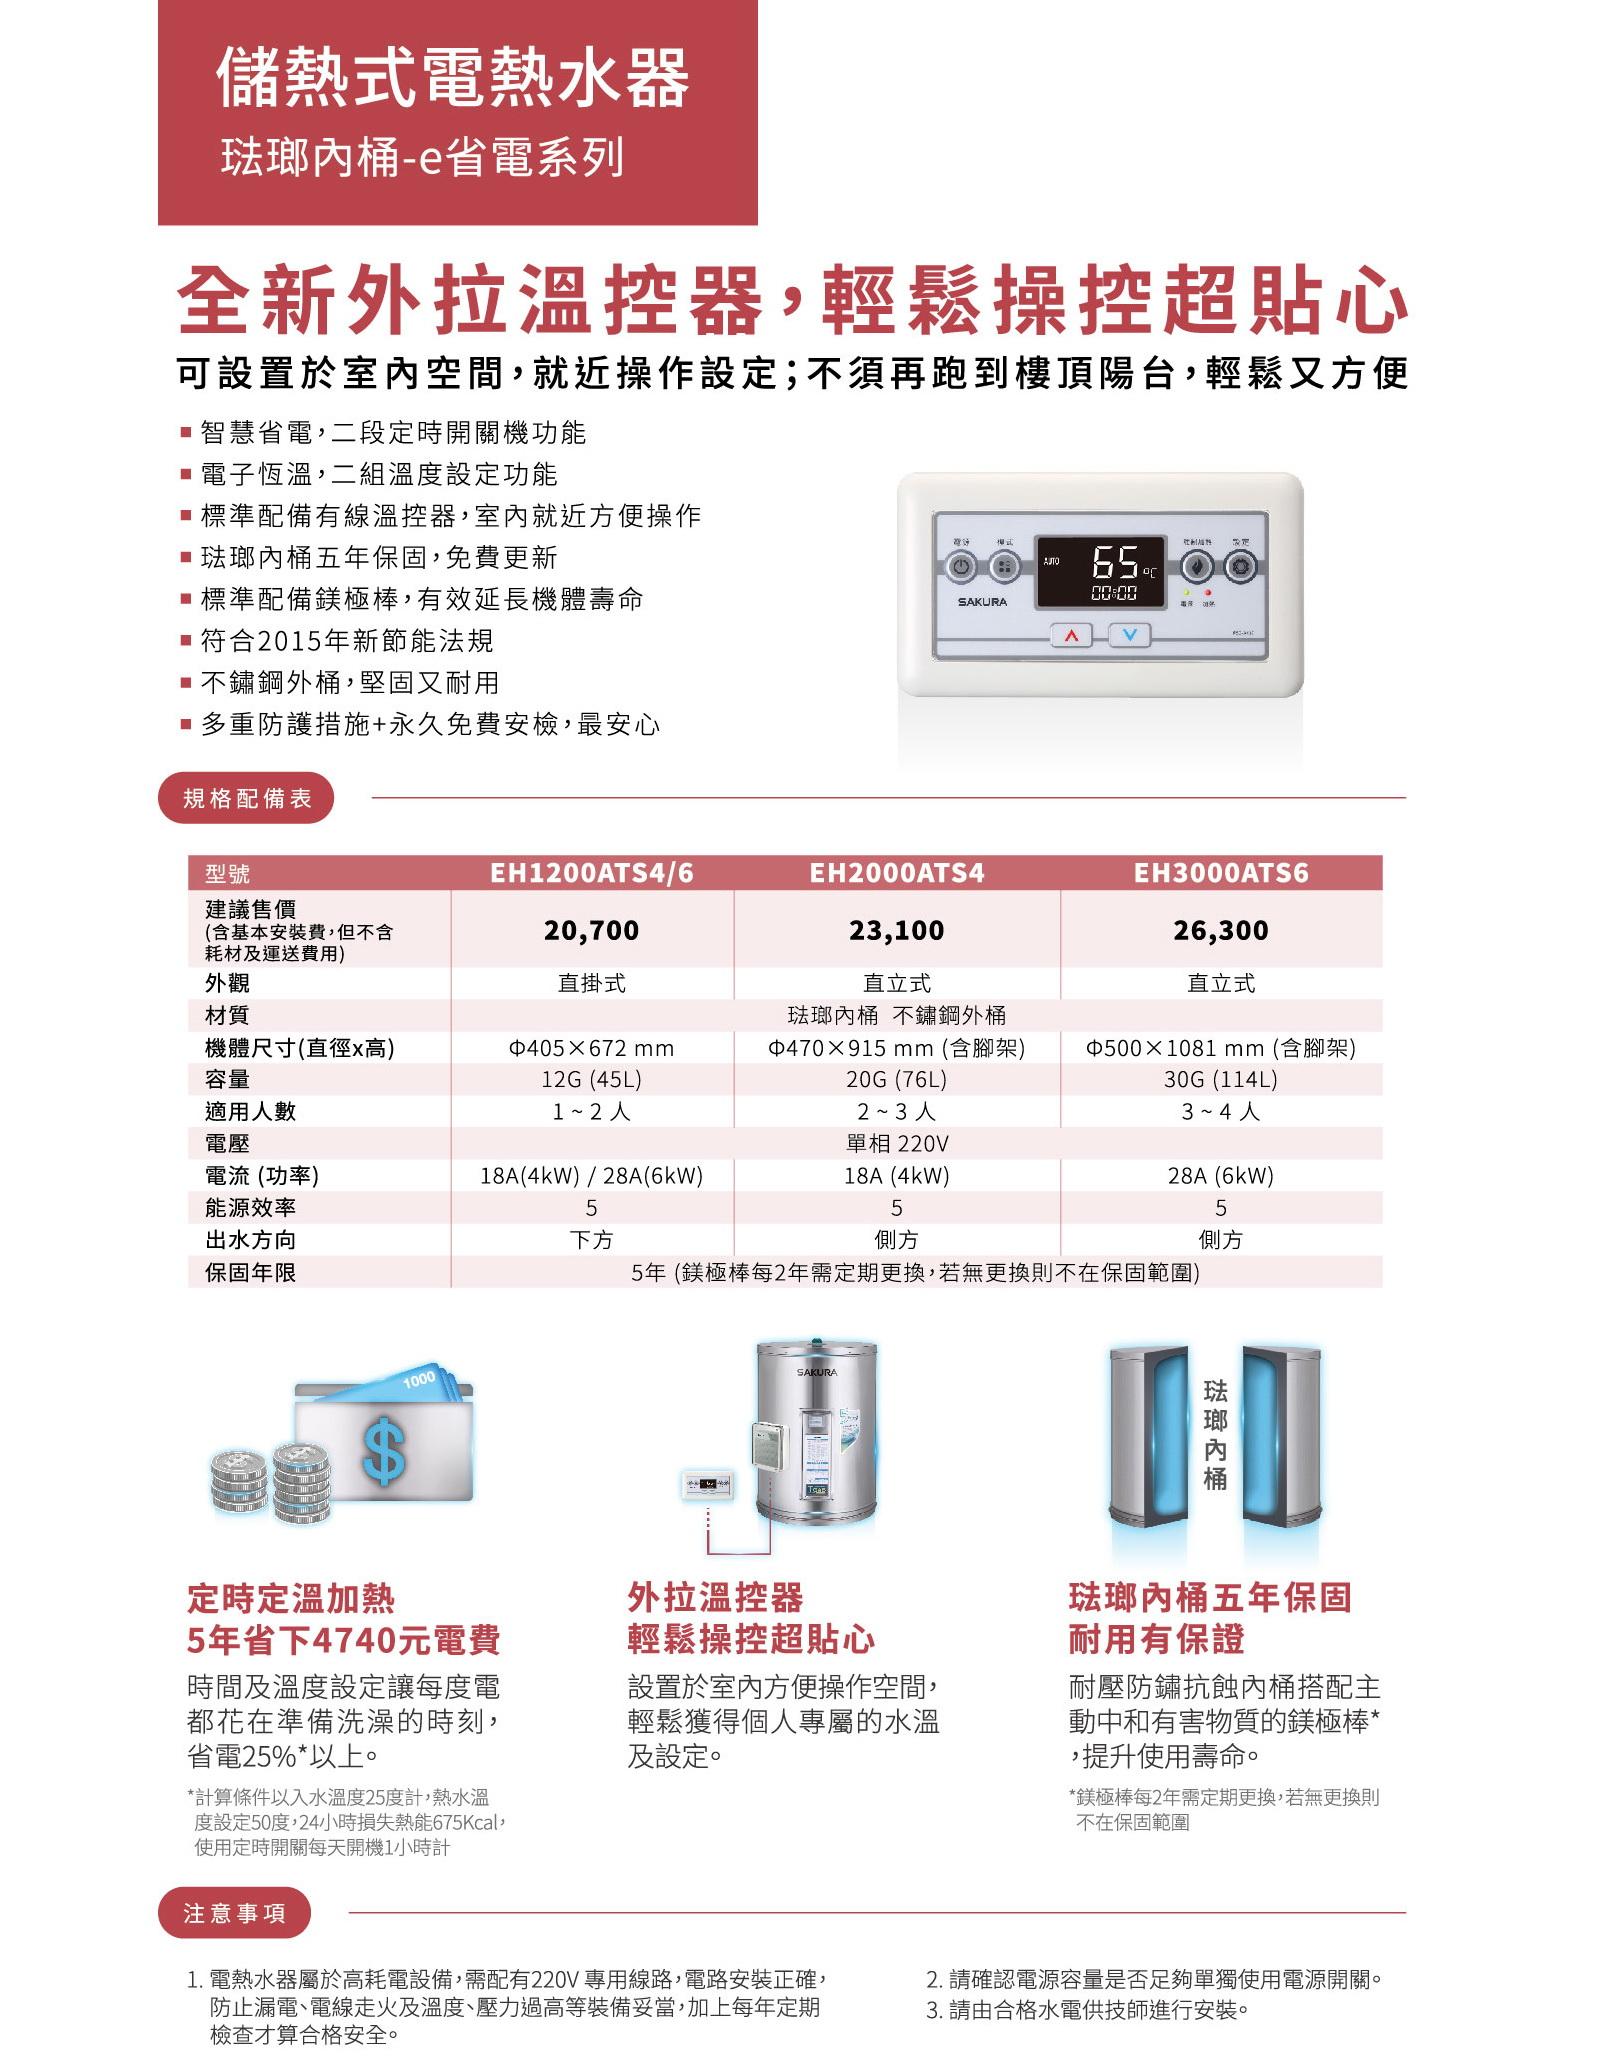 SAKURA_EHe省電外拉溫控DM_完成W210xH297mm出血W216xH303mm_雙面印刷-01-2.jpg